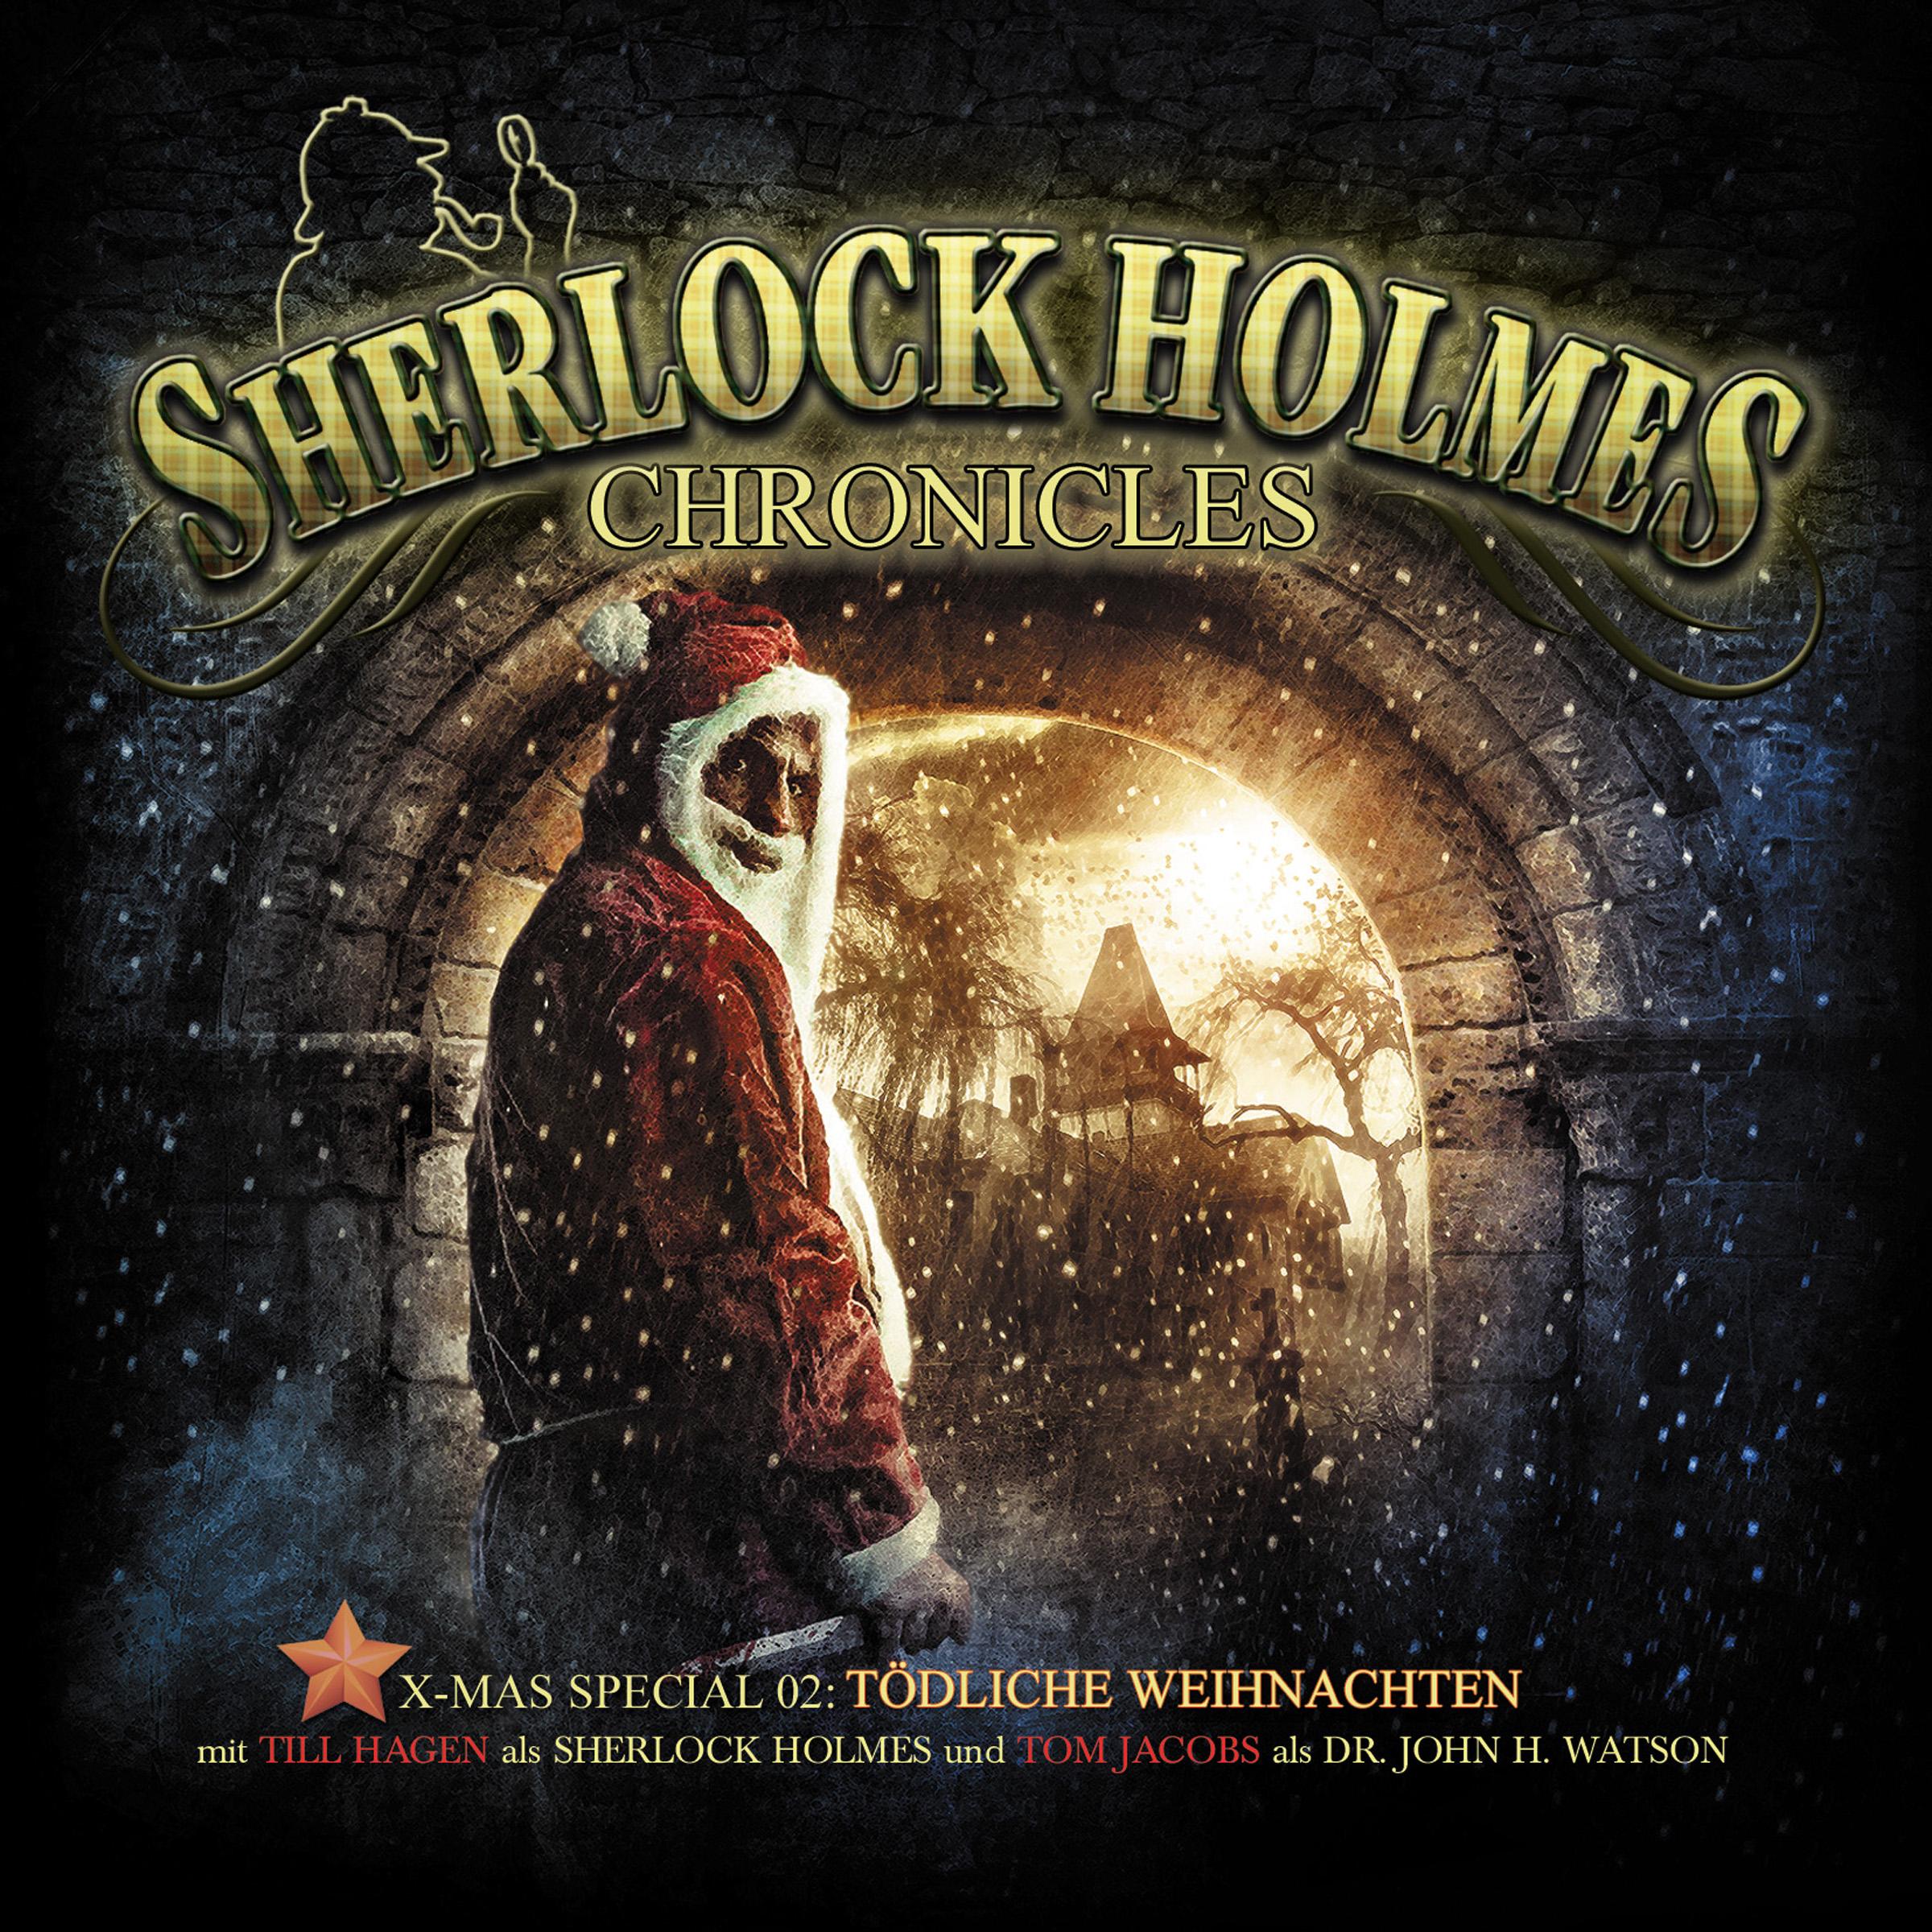 X-Mas Special – Sherlock Holmes Chronicles: 02 – Tödliche ...